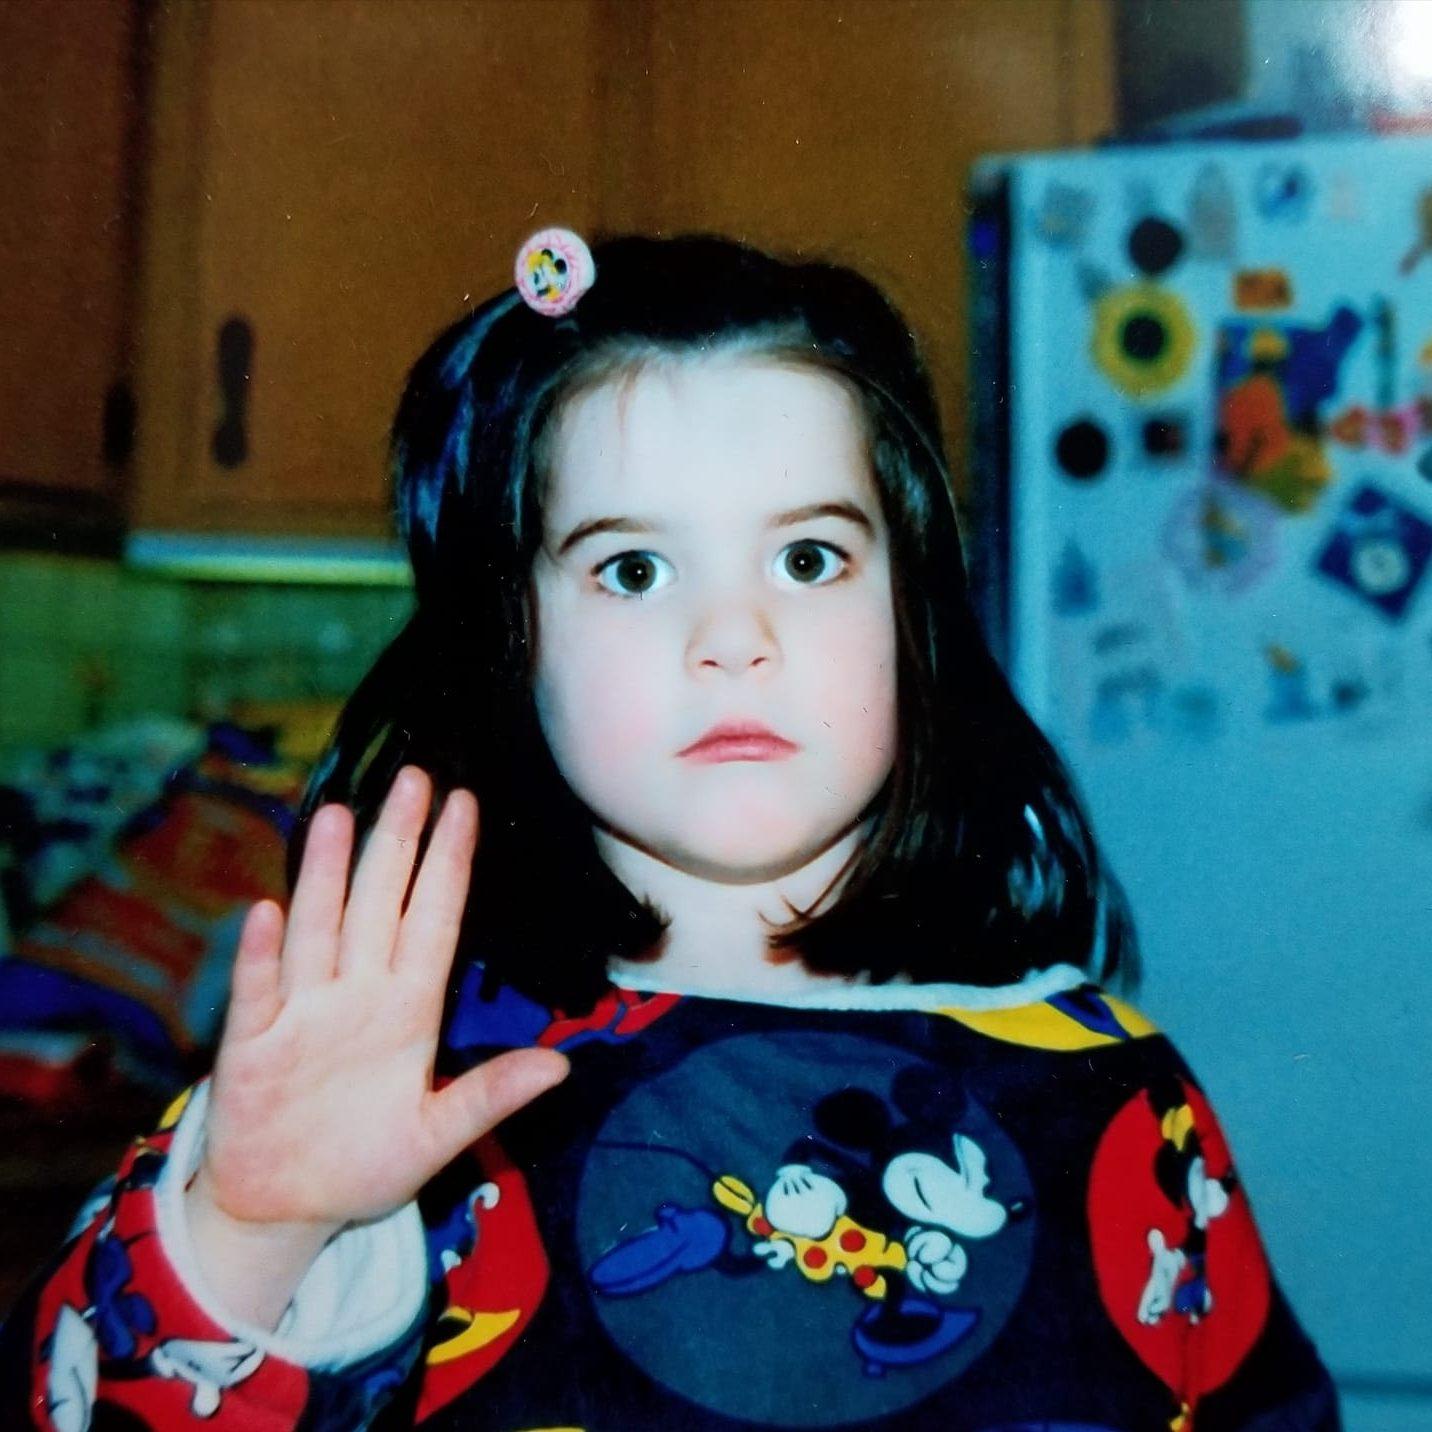 Meaghan Thomas as a kid